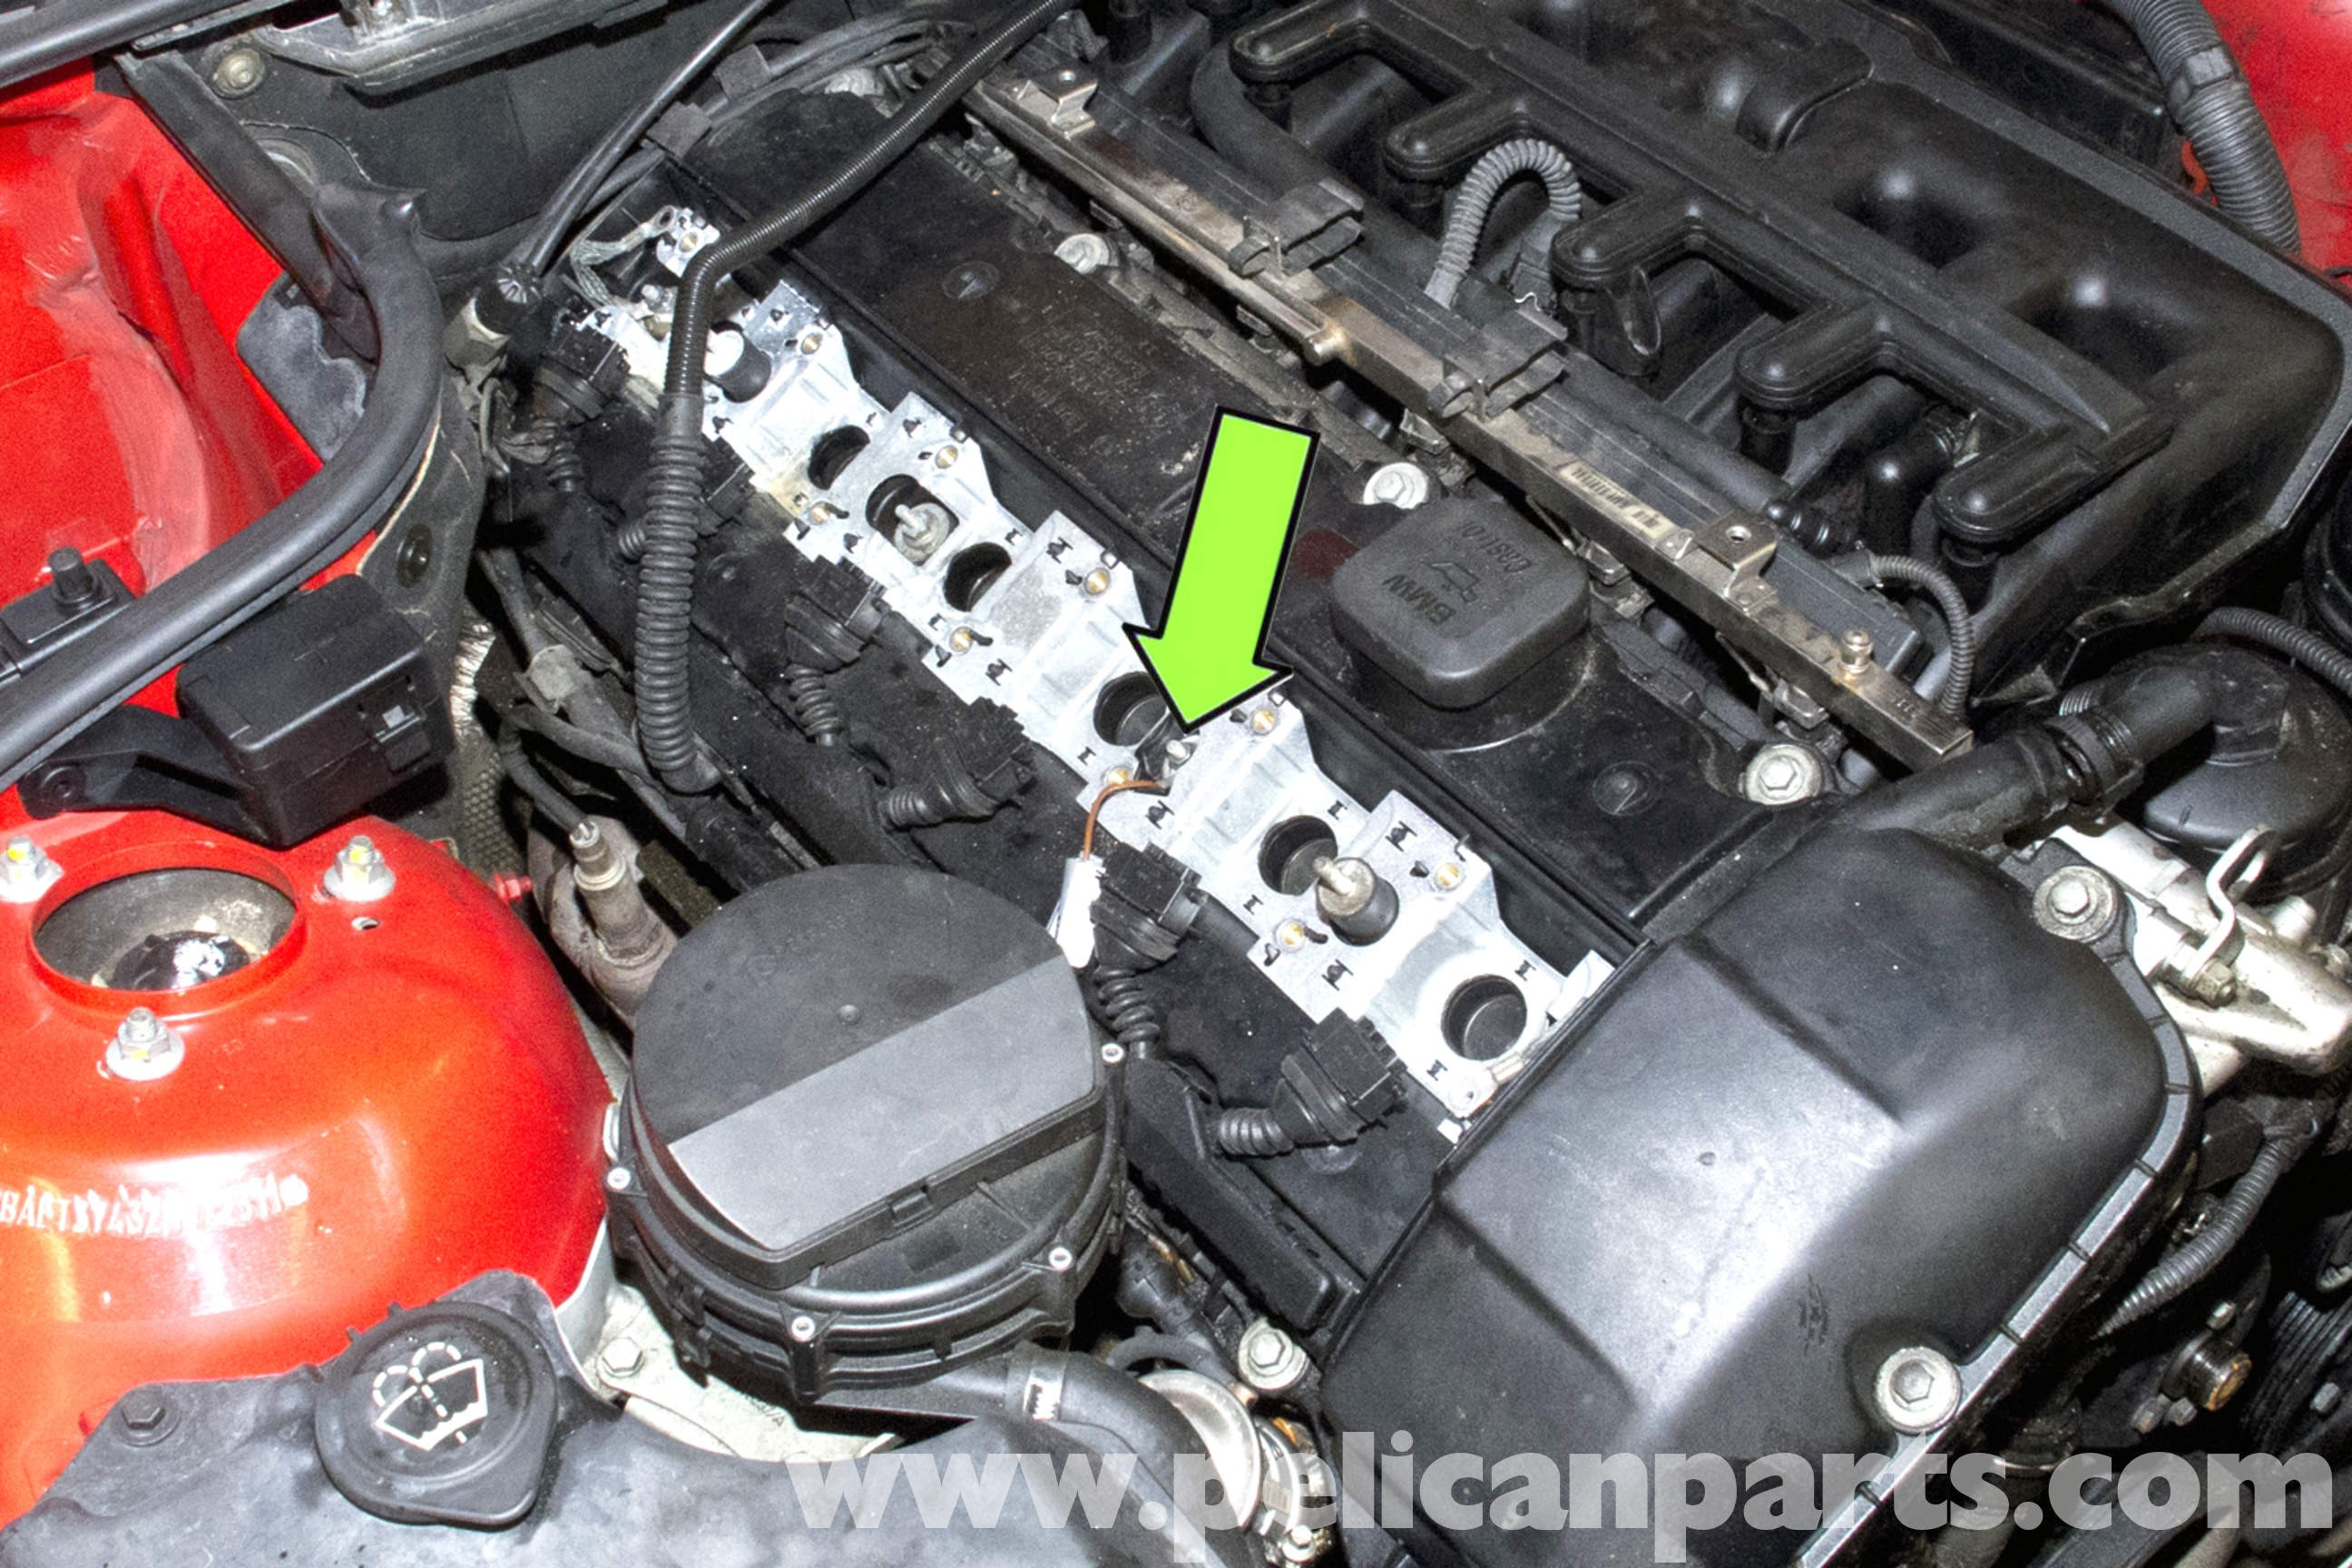 2006 Bmw 325i Engine Diagram Bmw 740i Engine Diagram Another Blog About Wiring Diagram • Of 2006 Bmw 325i Engine Diagram